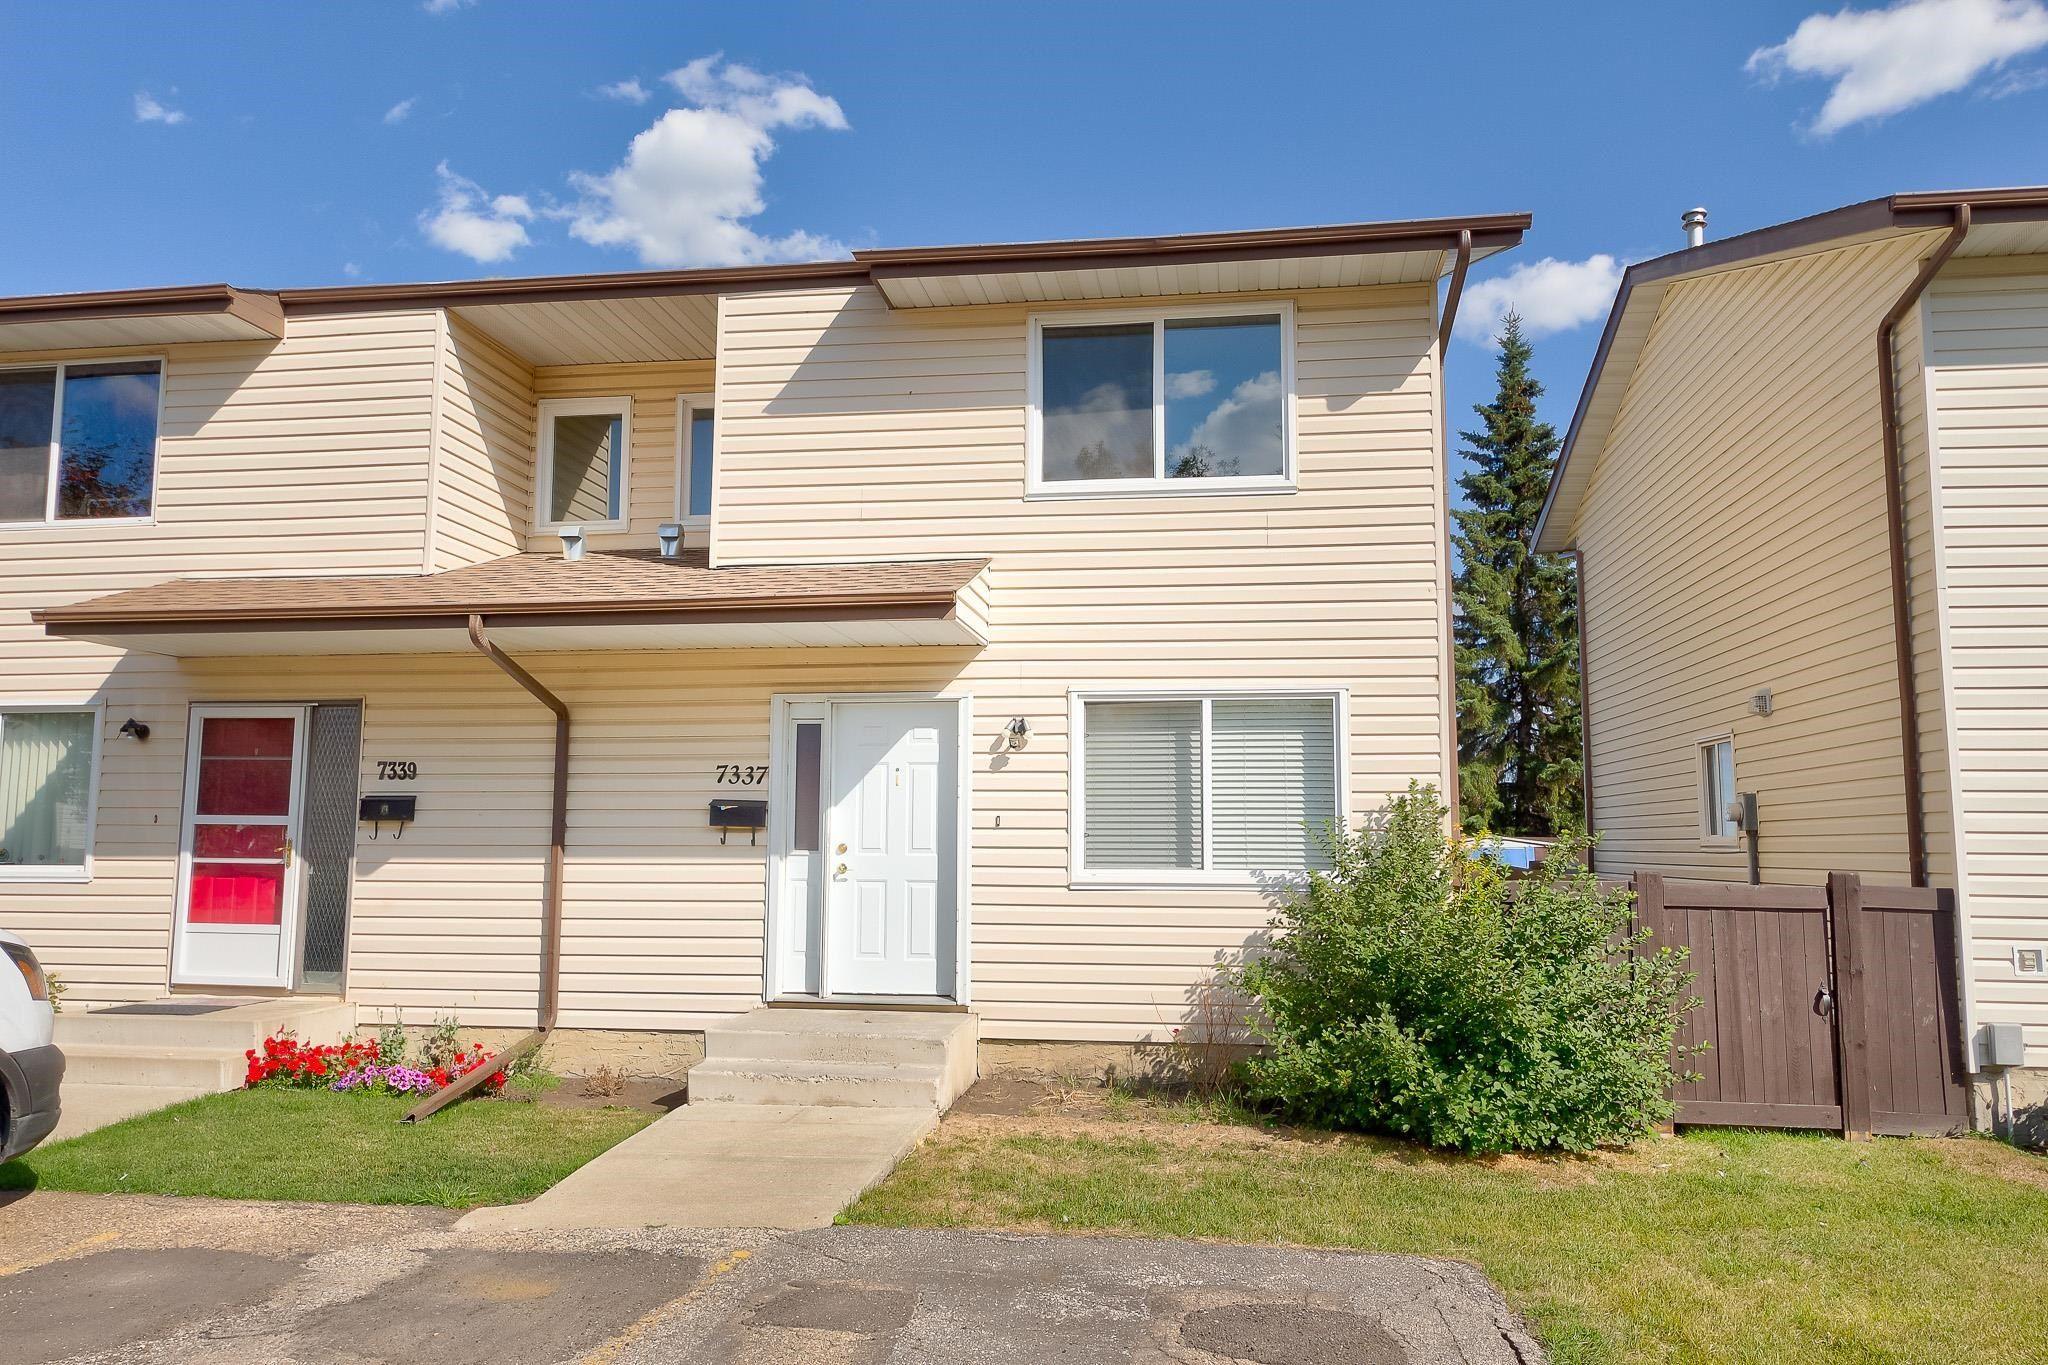 Main Photo: 7337 180 Street in Edmonton: Zone 20 Townhouse for sale : MLS®# E4260363